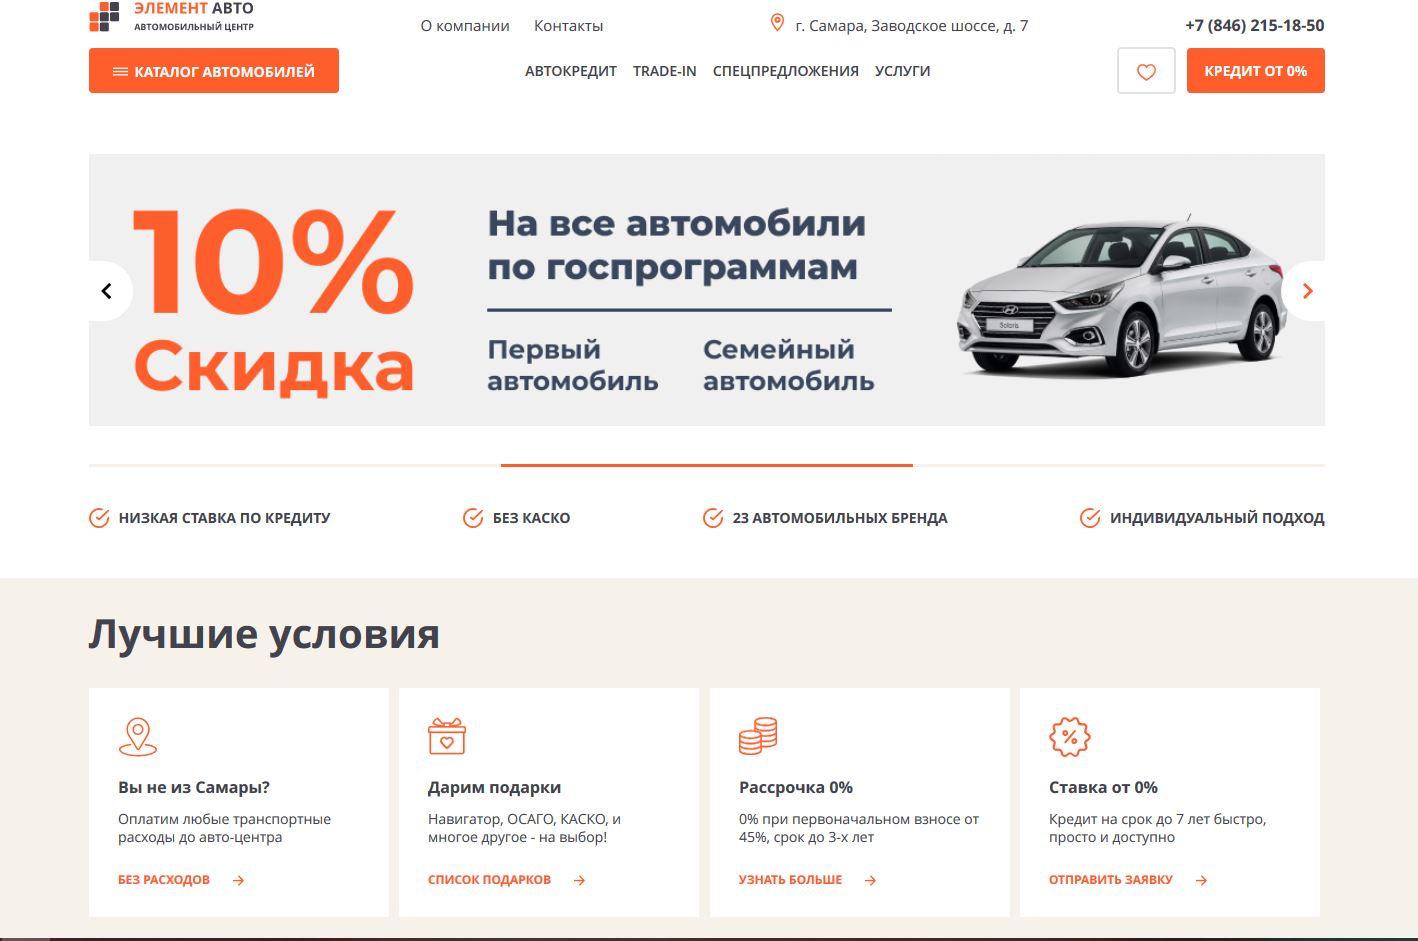 Автоцентр Элемент Авто